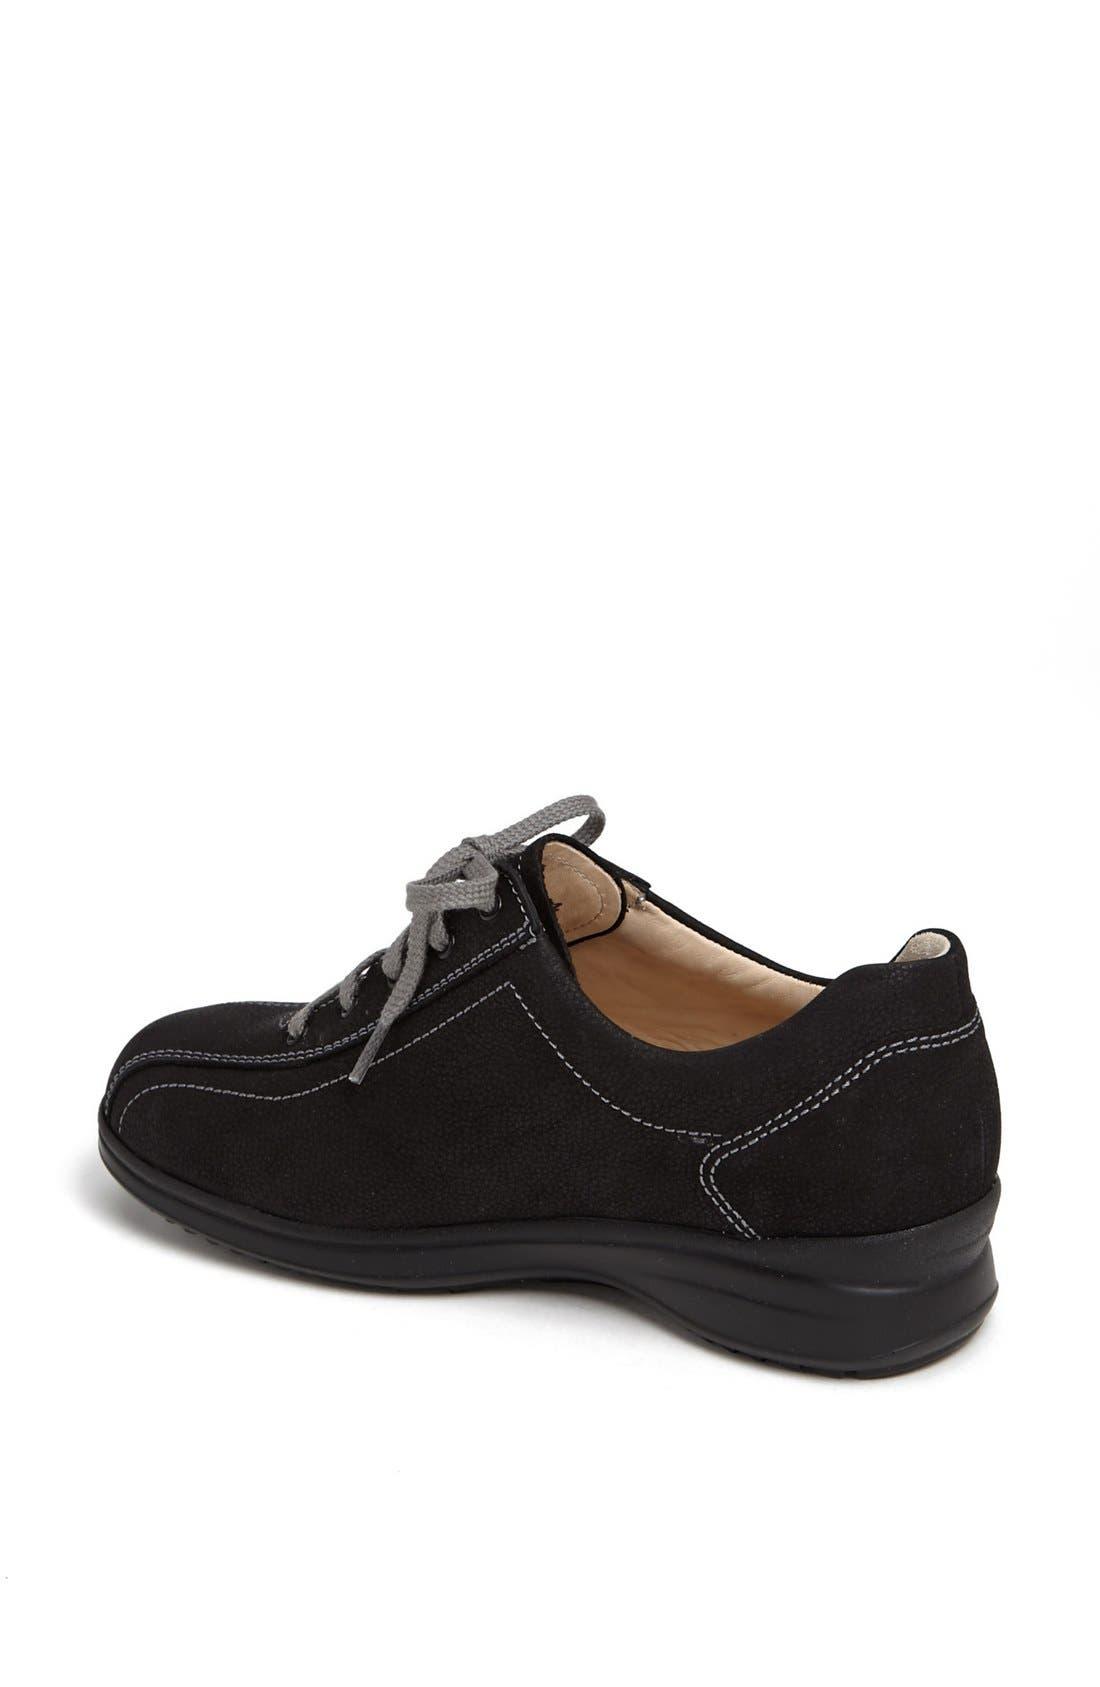 Alternate Image 2  - Finn Comfort 'Almeria' Sneaker